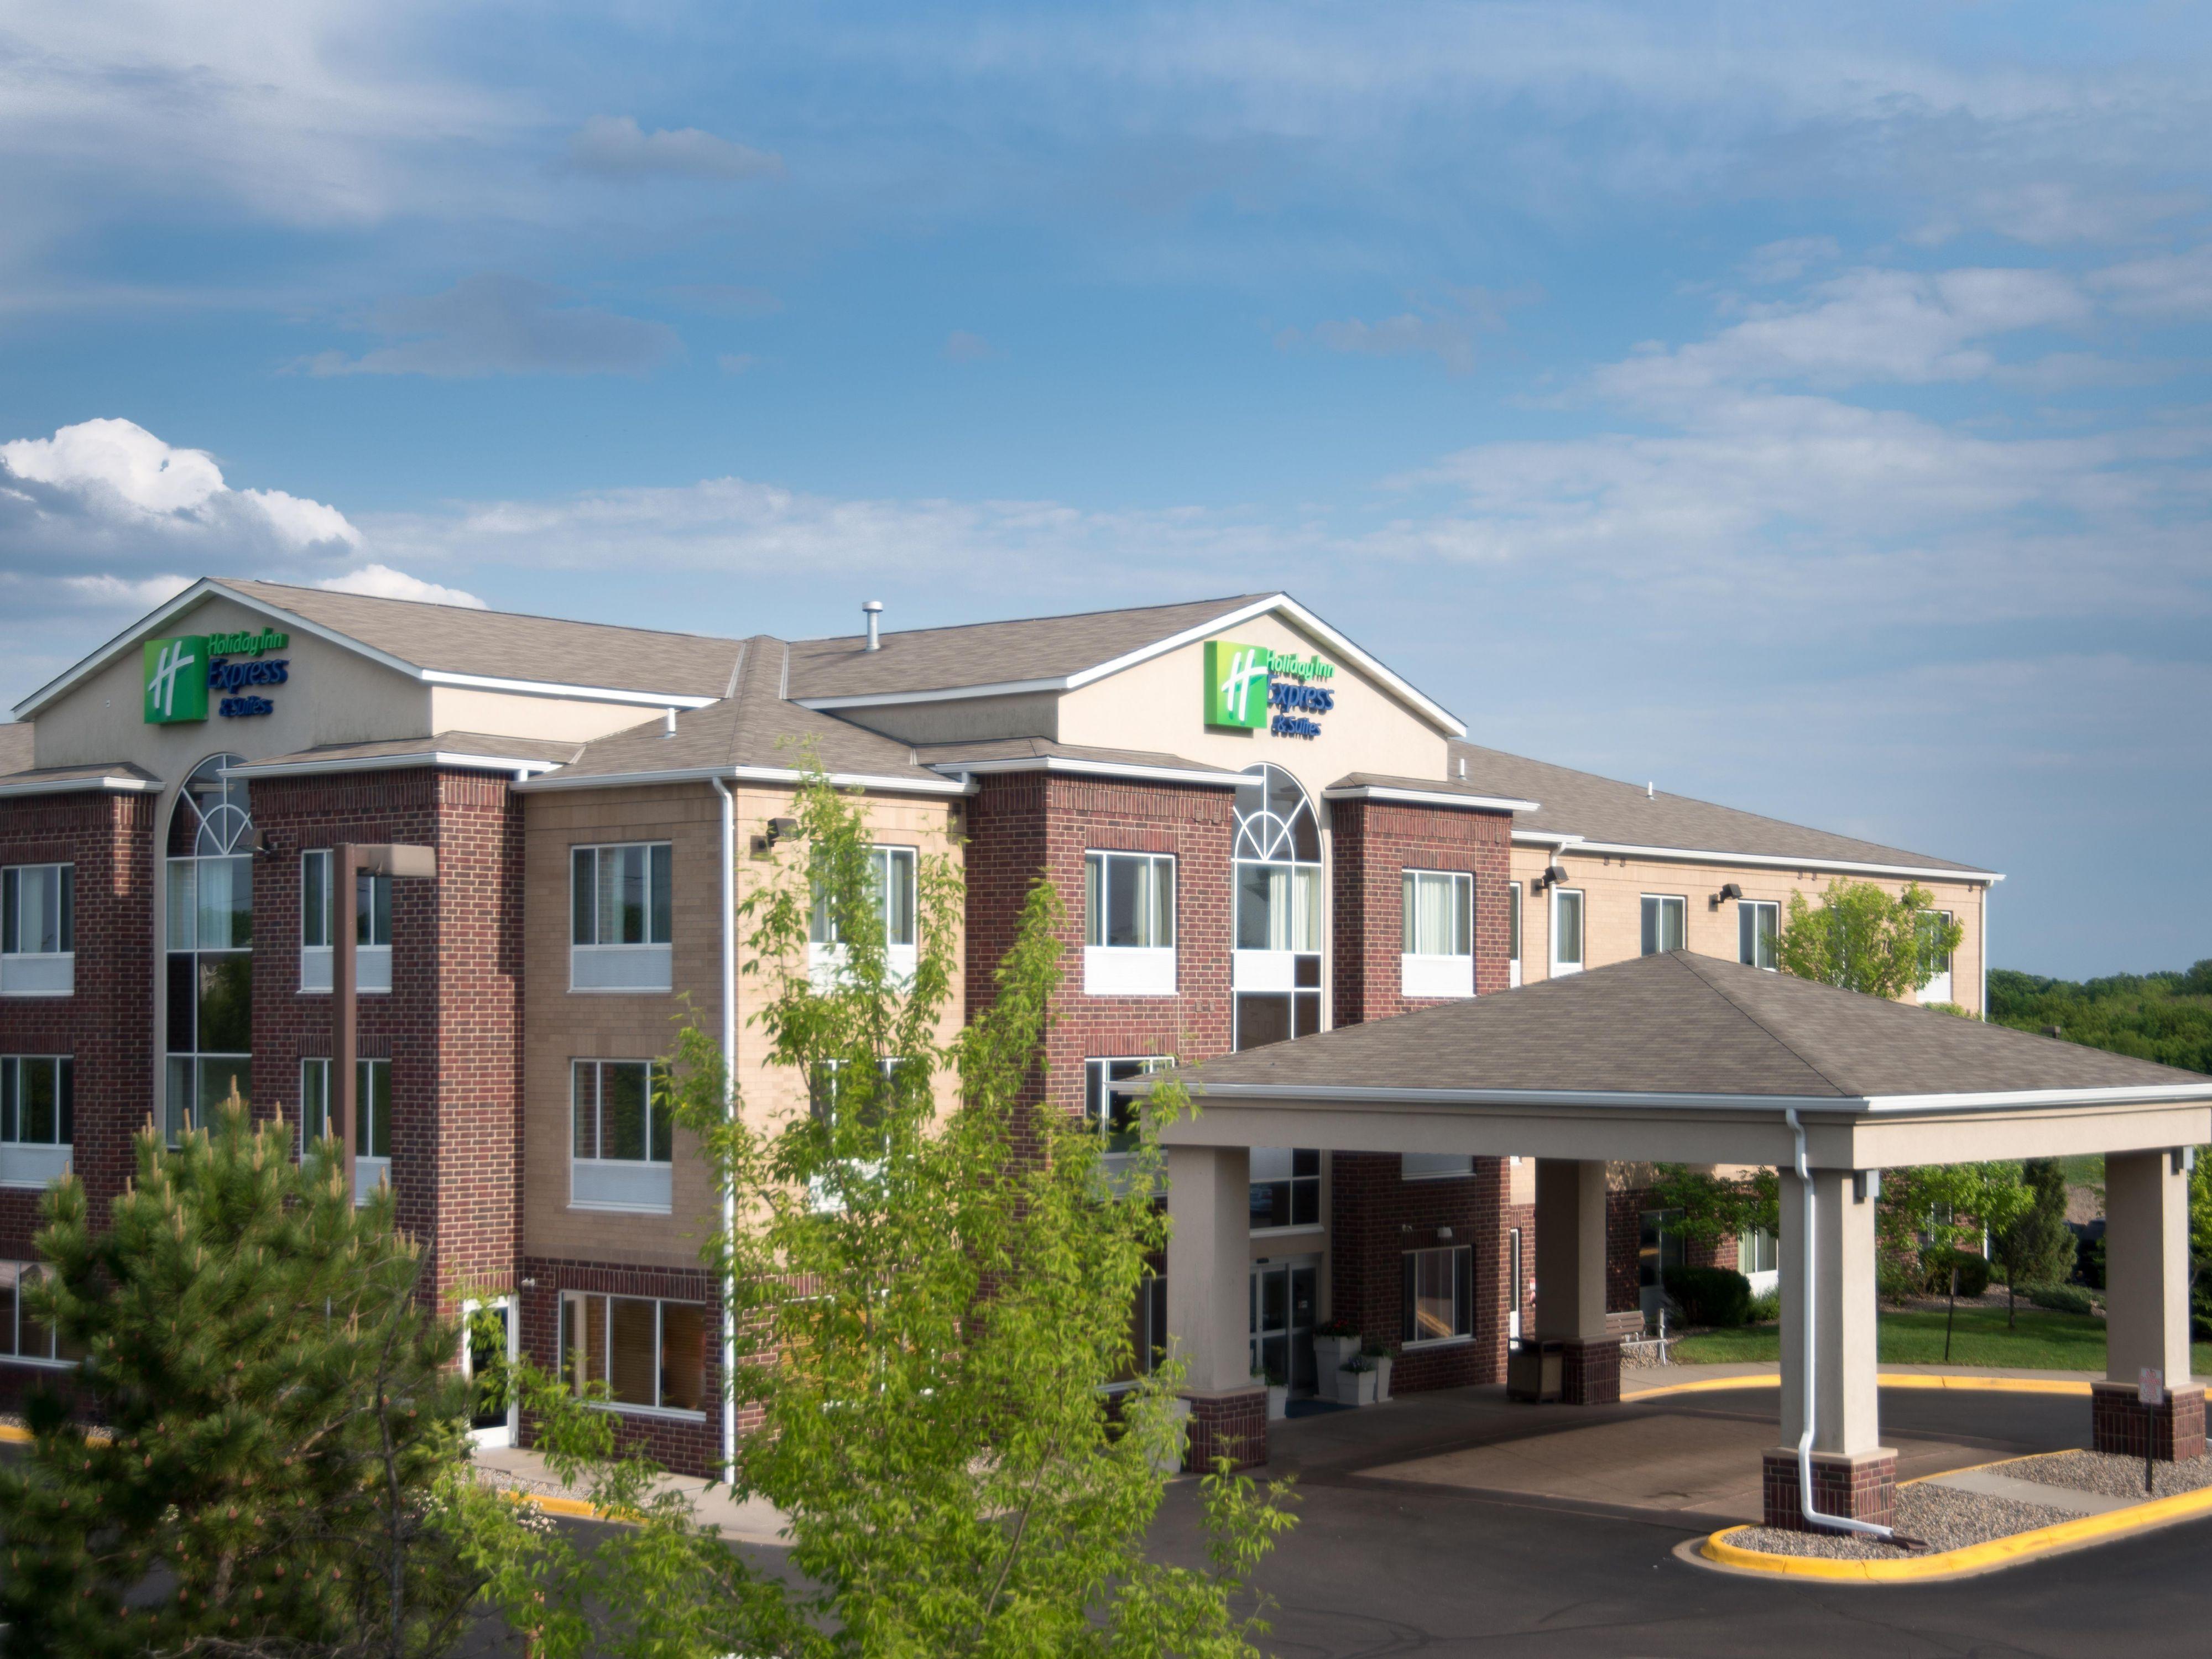 Holiday Inn Express Suites Chanhen In Shako Minnesota